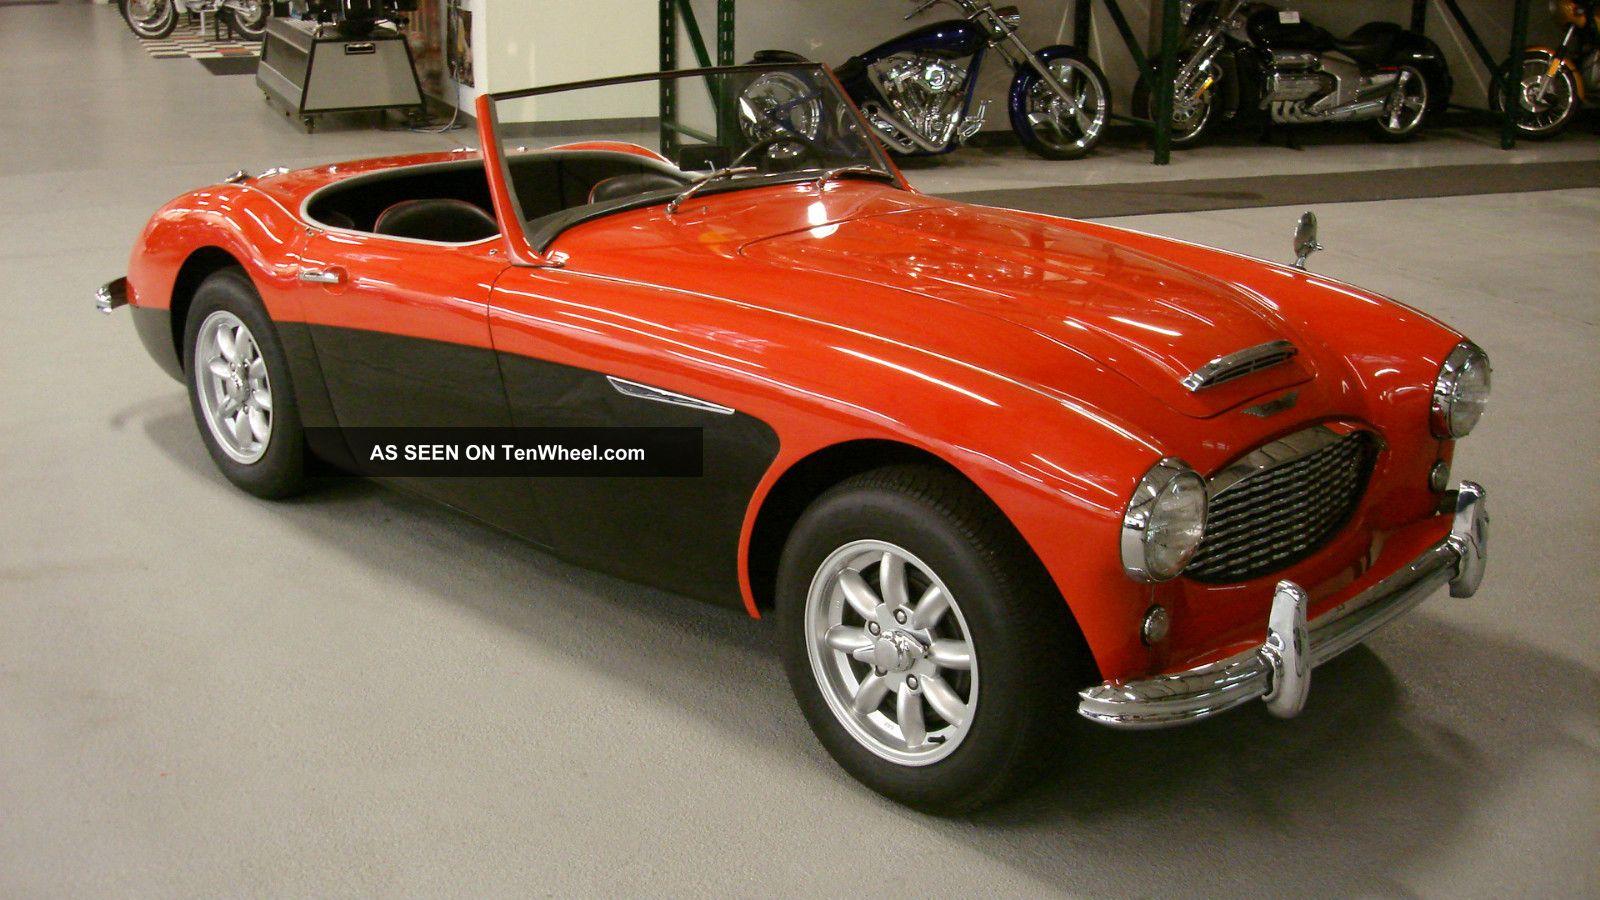 1958 Austin Healey 100 6 Bn6 2 Seat Roadster